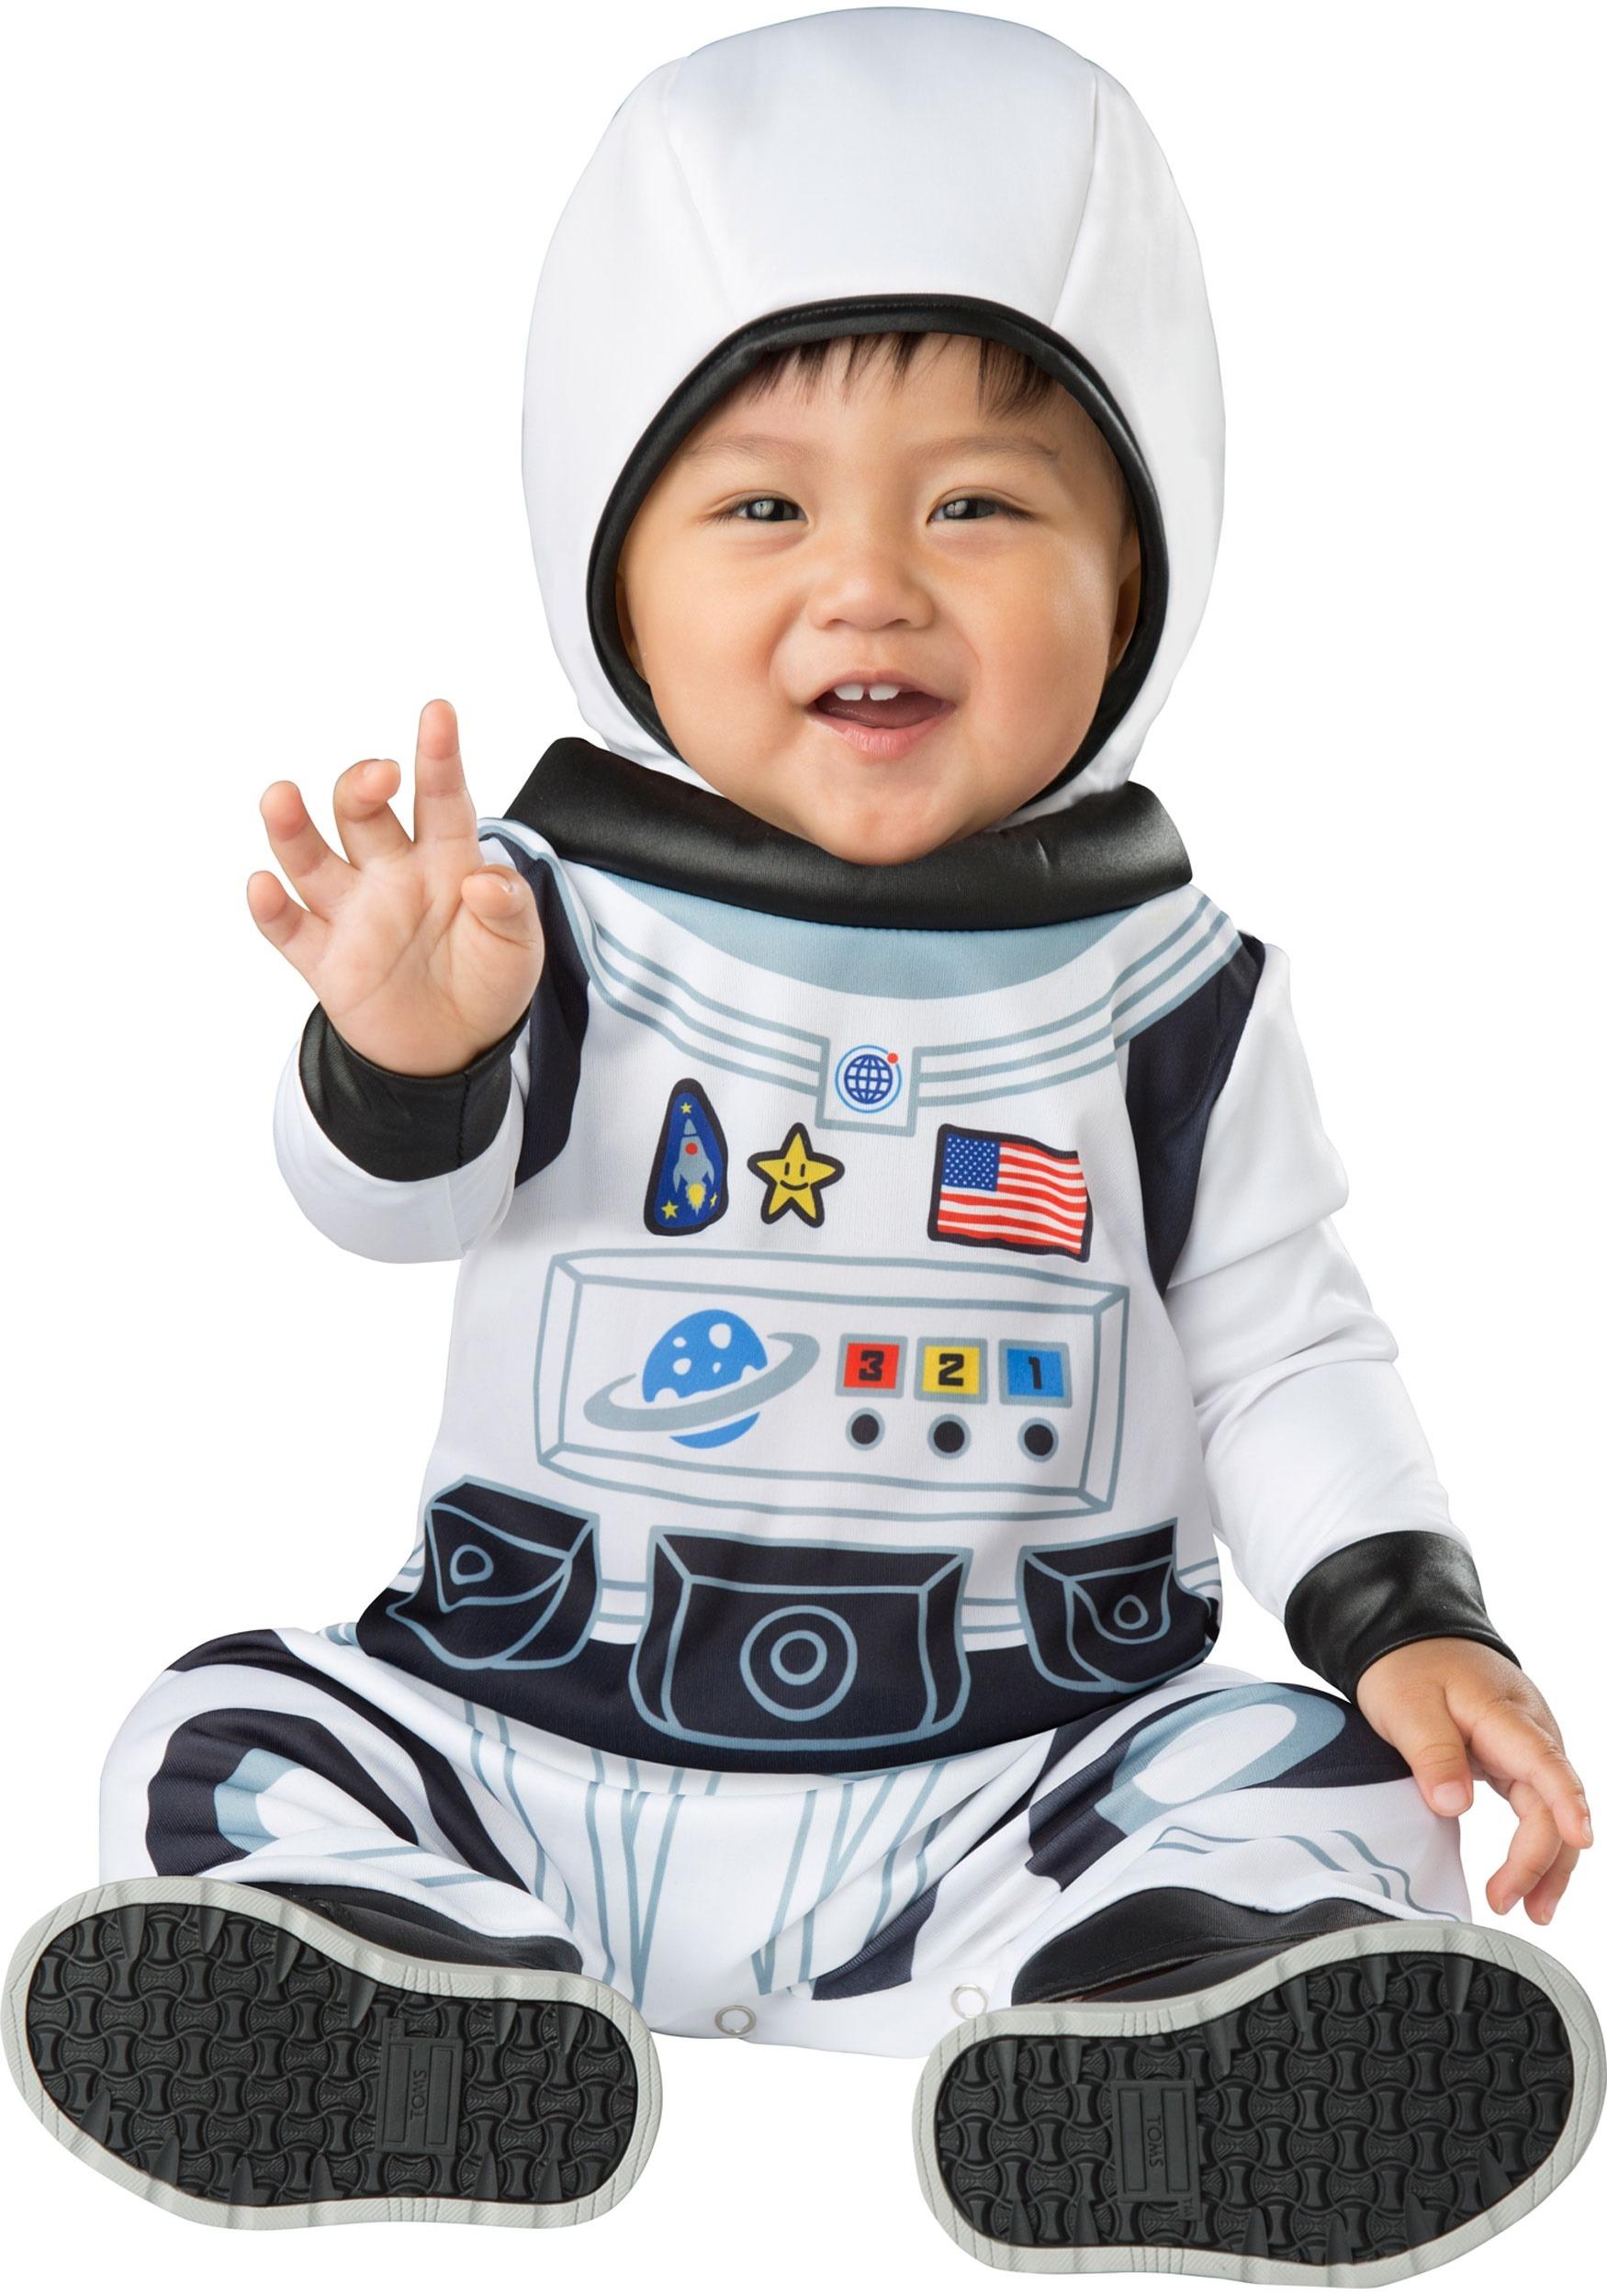 Astronaut Tot Infant Costume  sc 1 st  Halloween Costumes & Astronaut Tot Costume for Infants